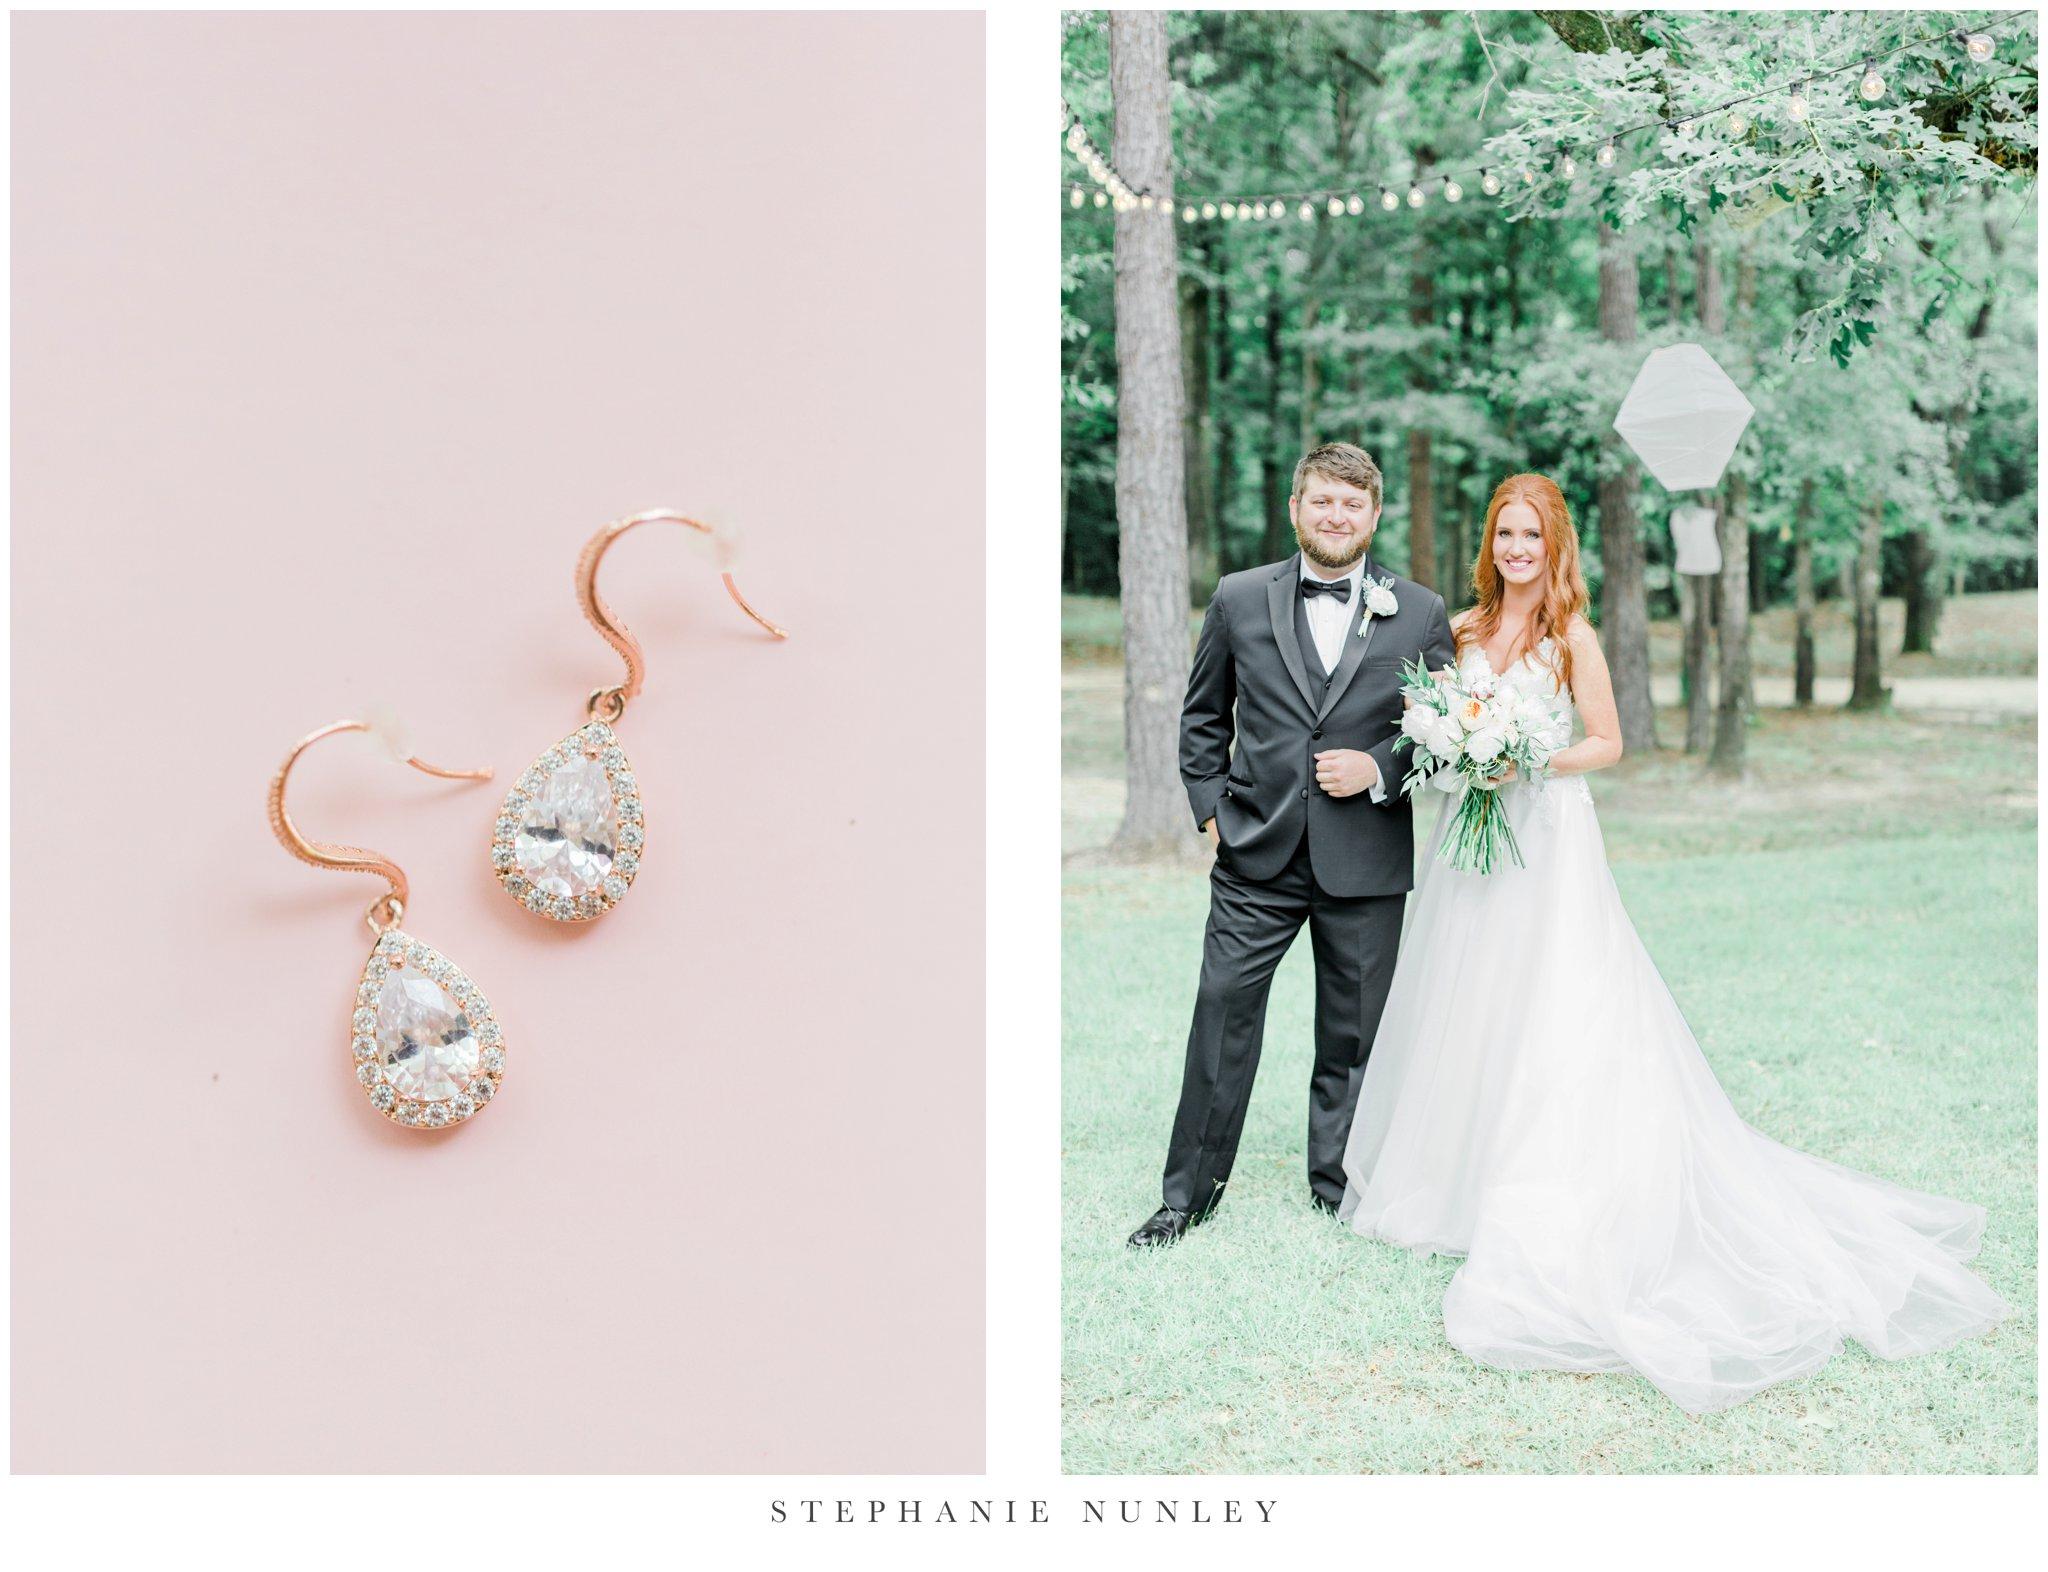 blessing-tree-farm-arkansas-wedding-0019.jpg